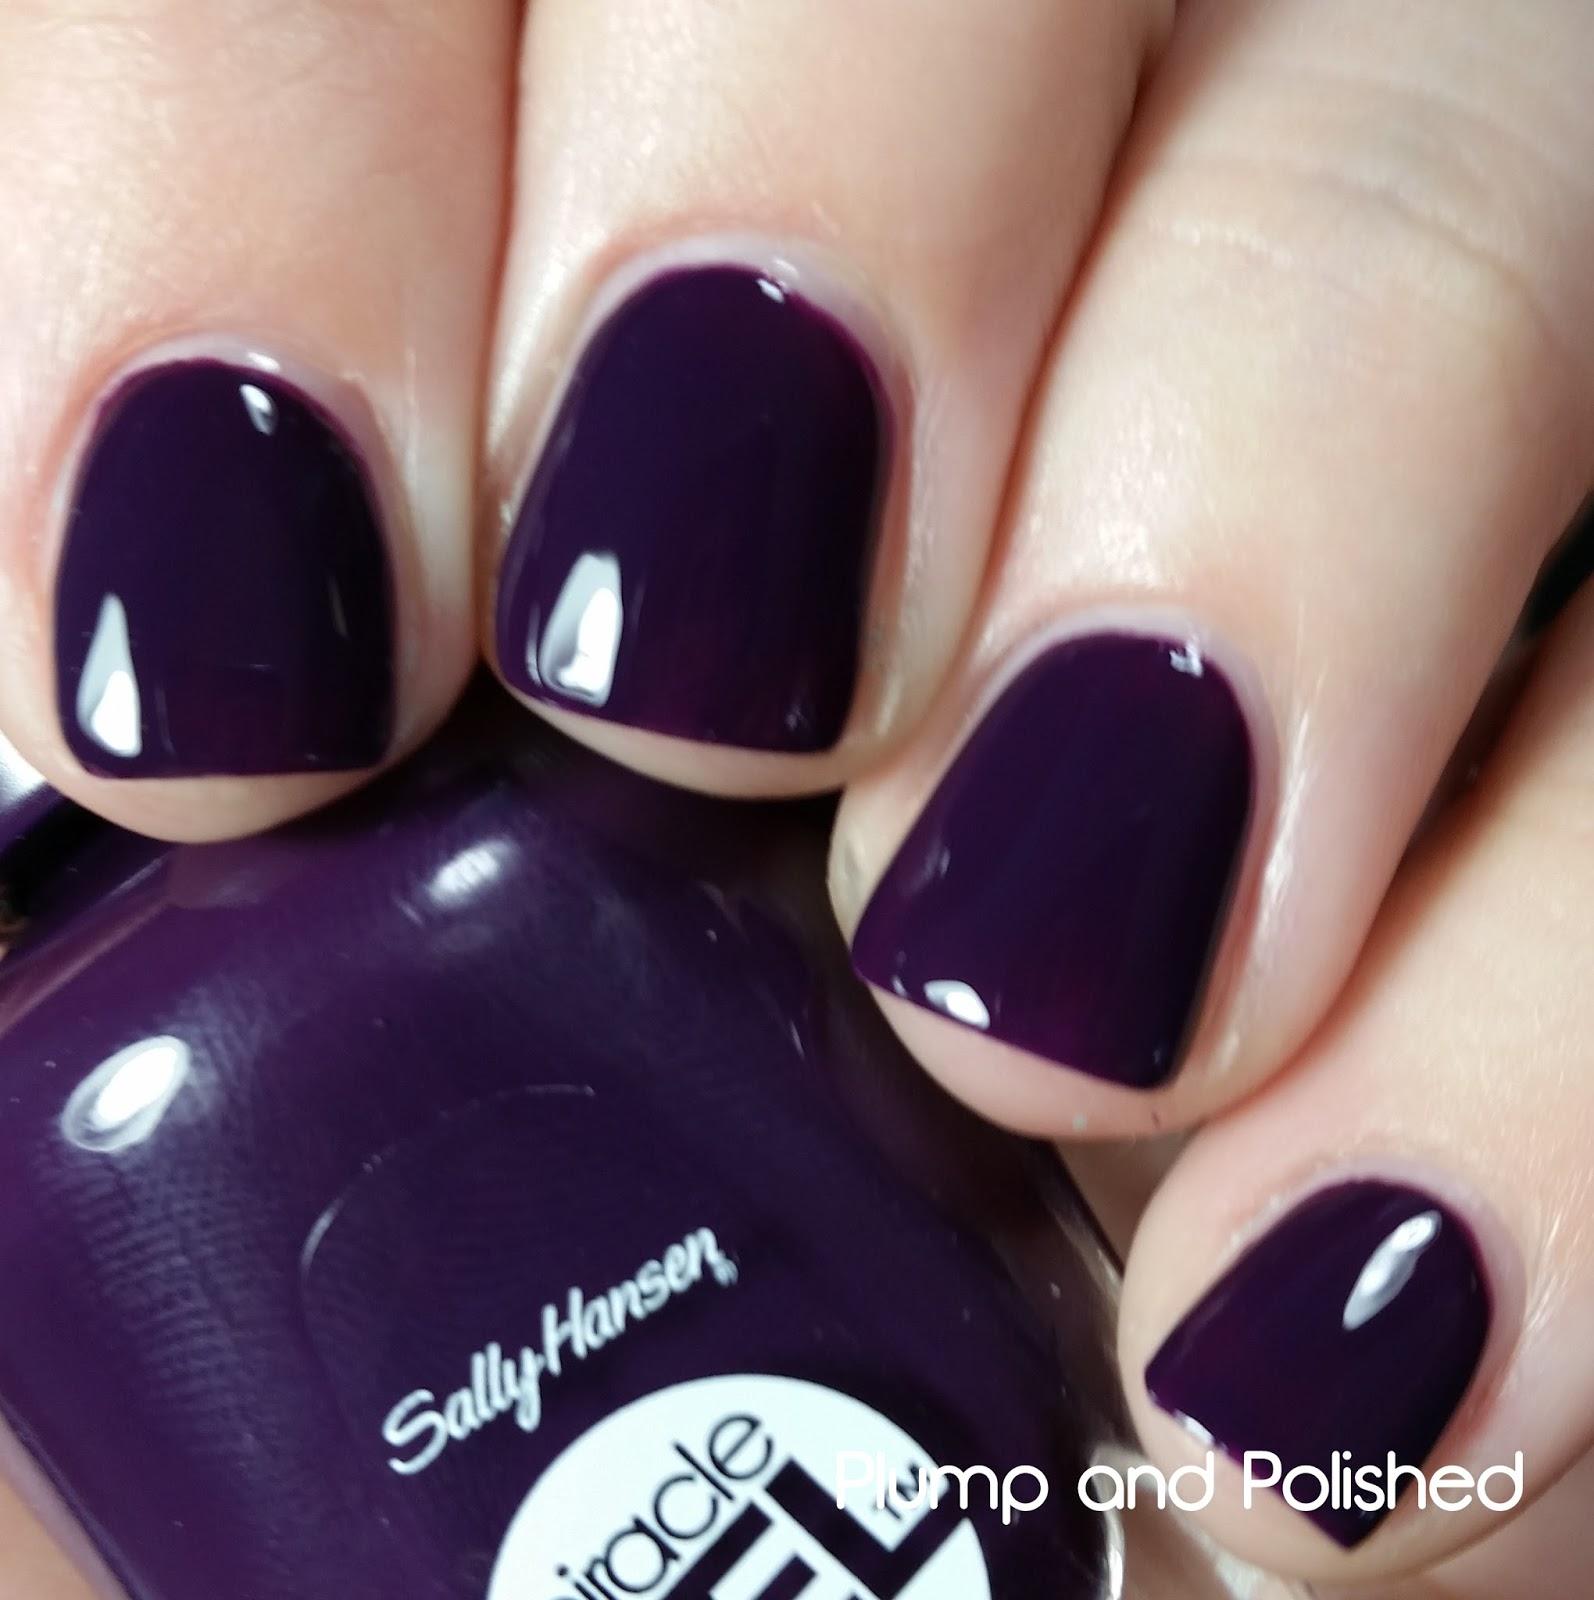 Sally Hansen No Light Gel Polish Instructions – Papillon Day Spa